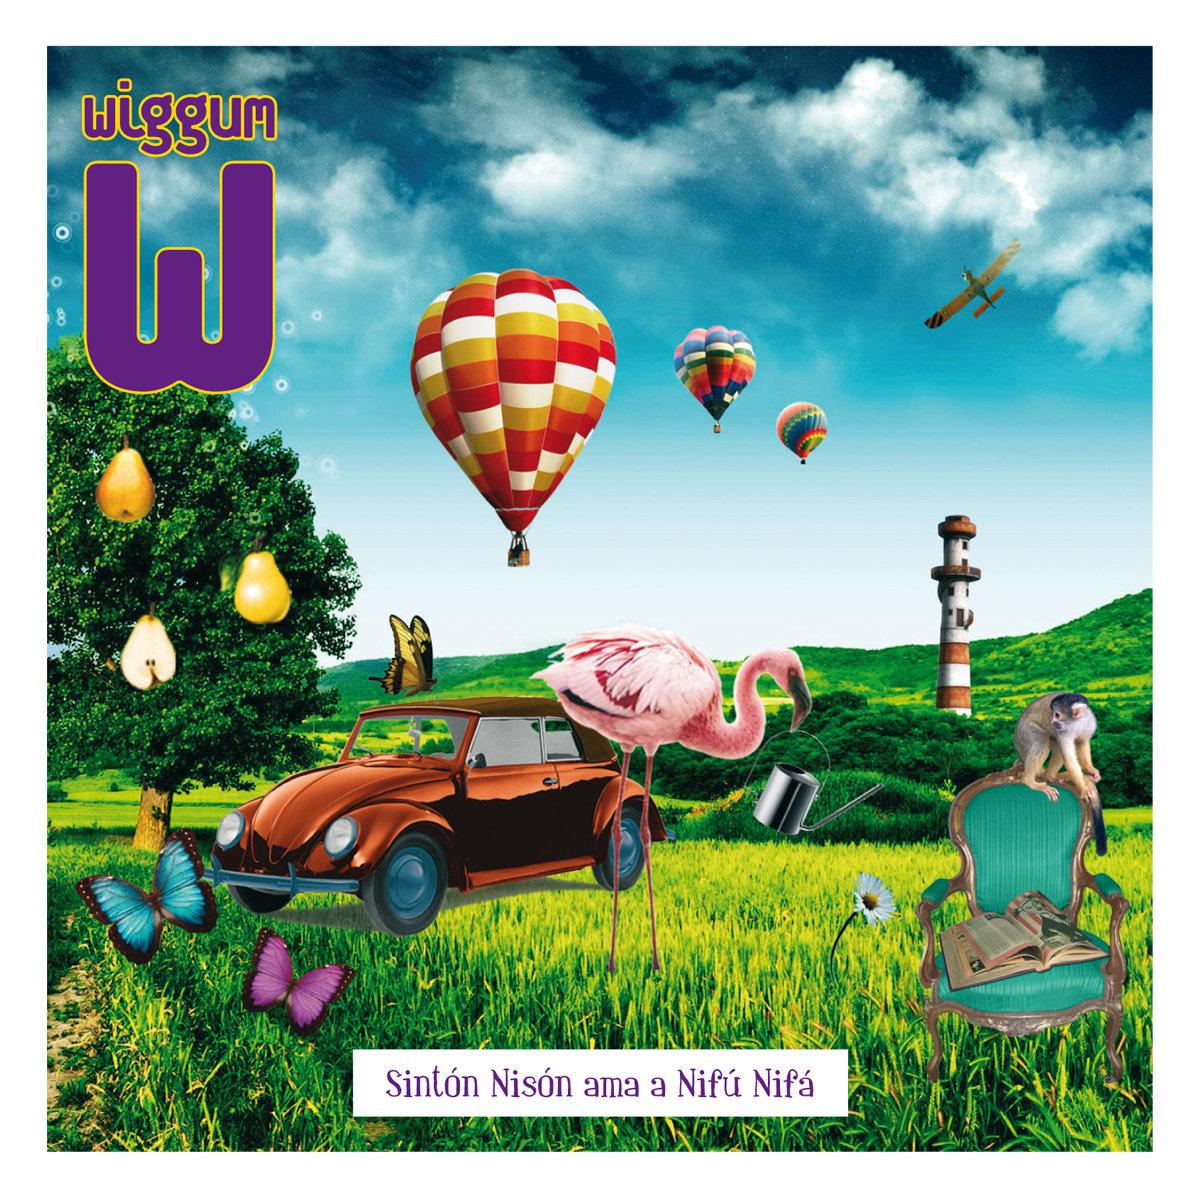 Wiggum – Sintón Nisón ama a Nifú Nifá (2011)